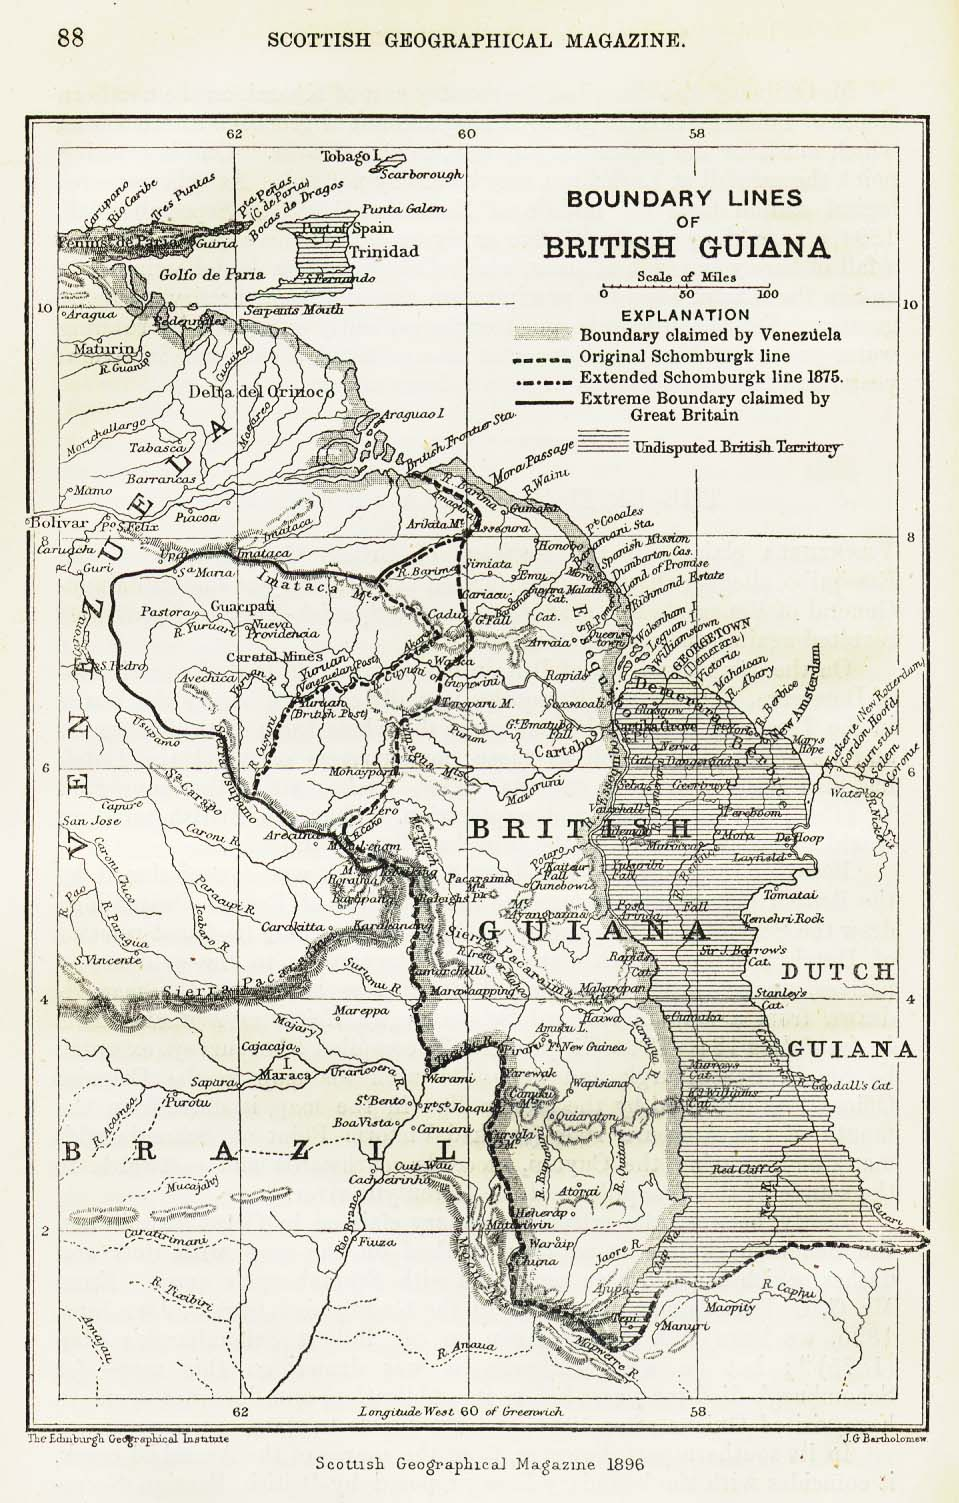 Mapa de la Guyana Británica 1896